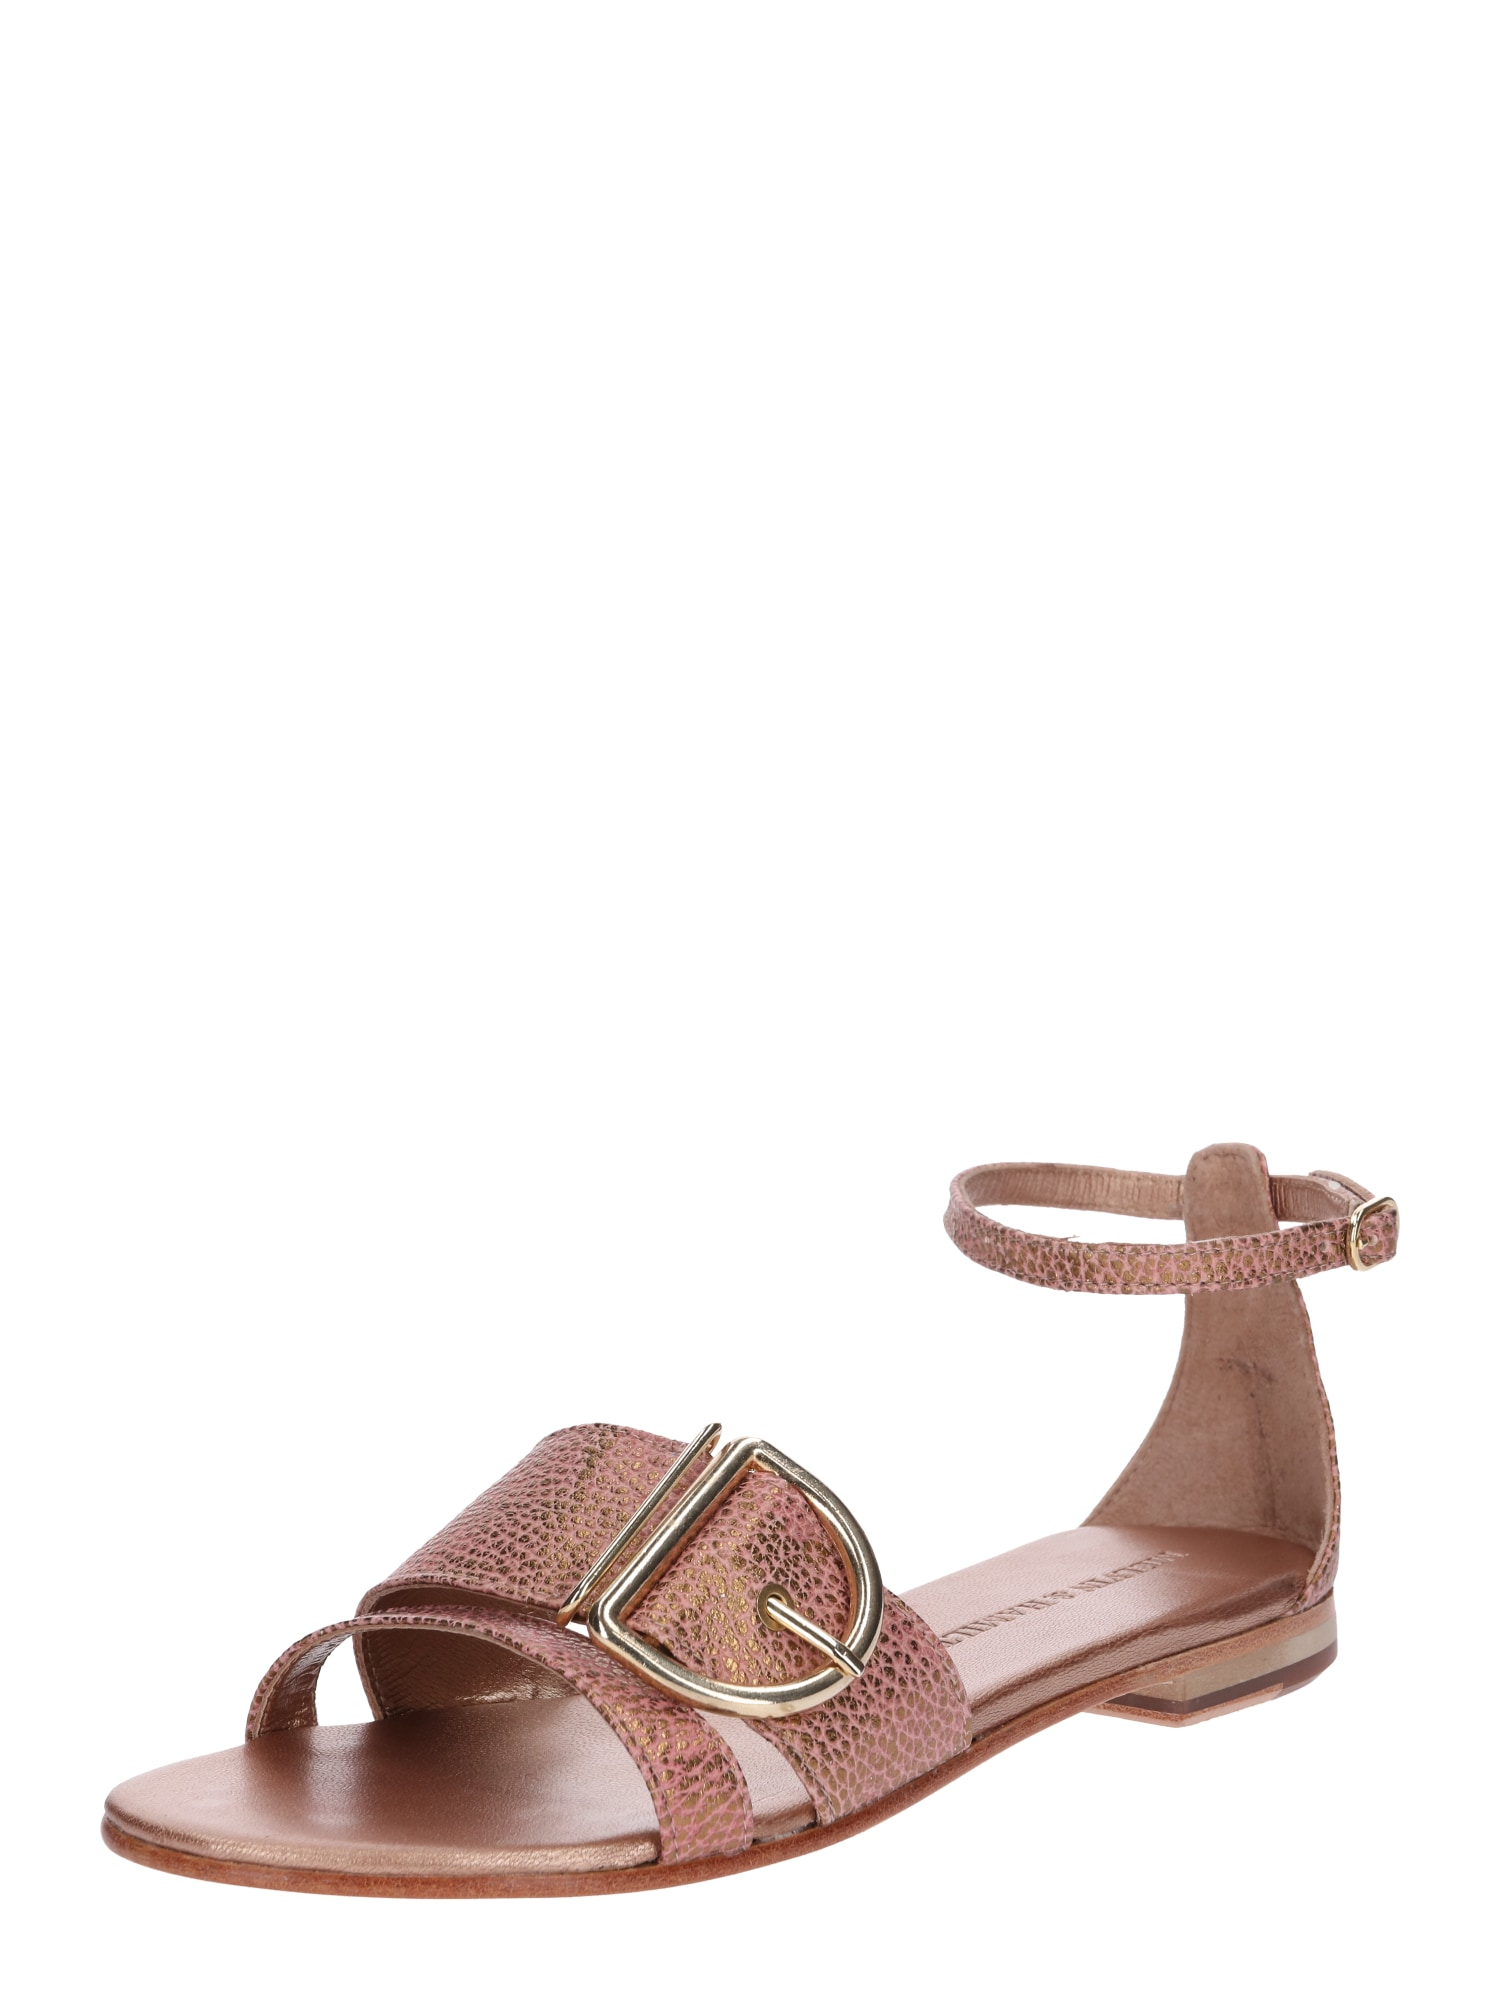 Páskové sandály Hanna bronzová zlatá MELVIN & HAMILTON